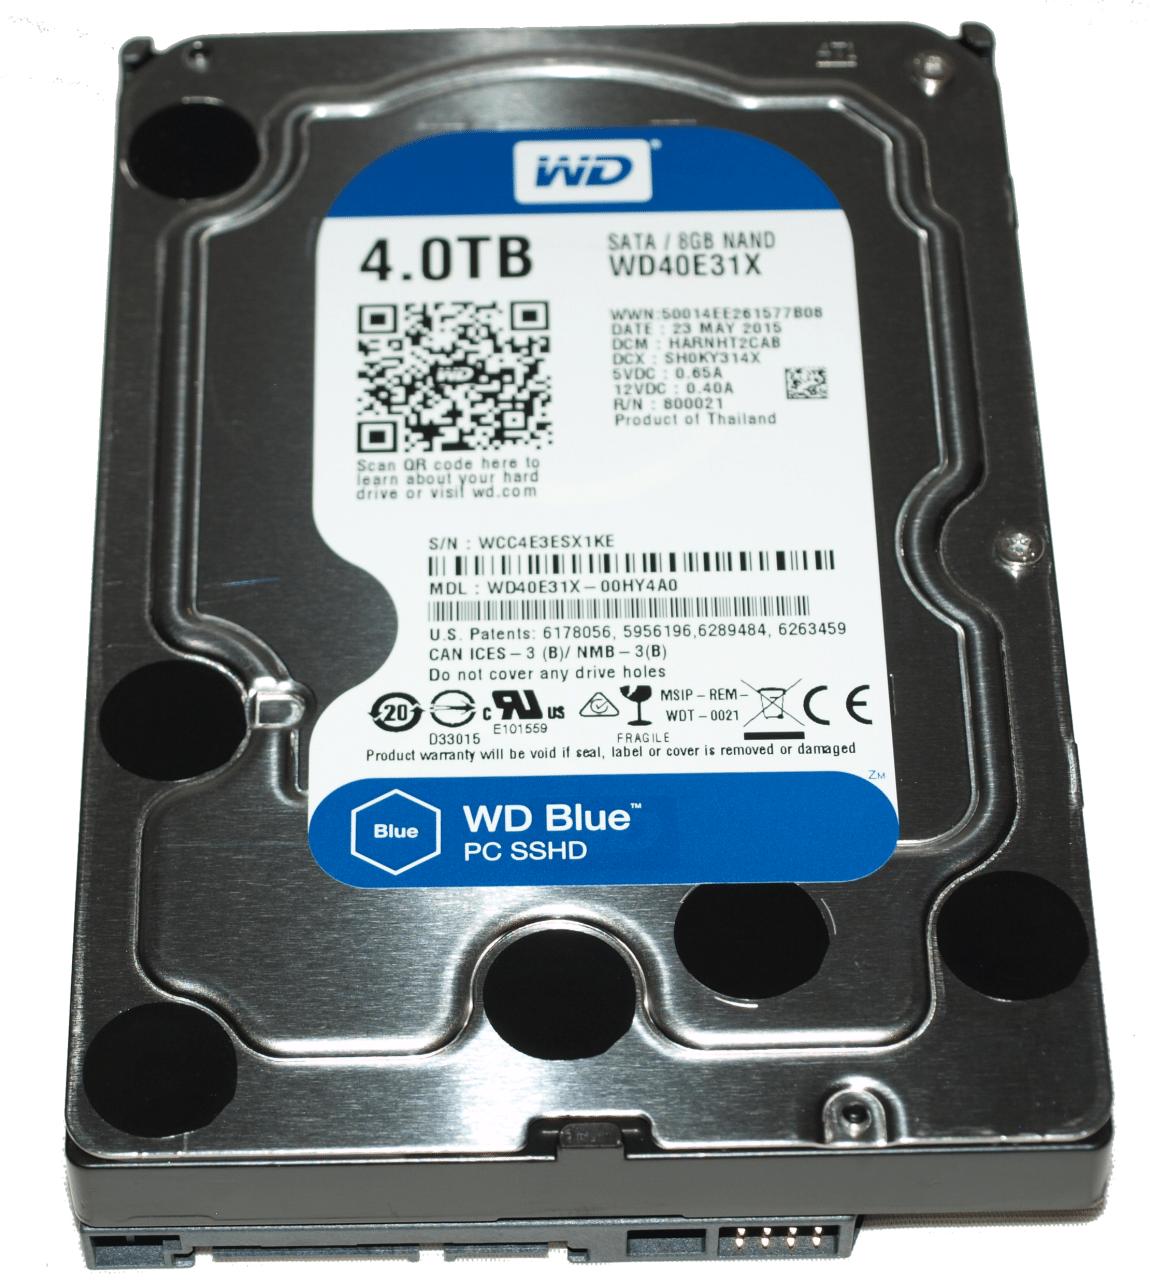 Western Digital Blue 4TB SSHD (WD40E31X) Platter & SSD Ride